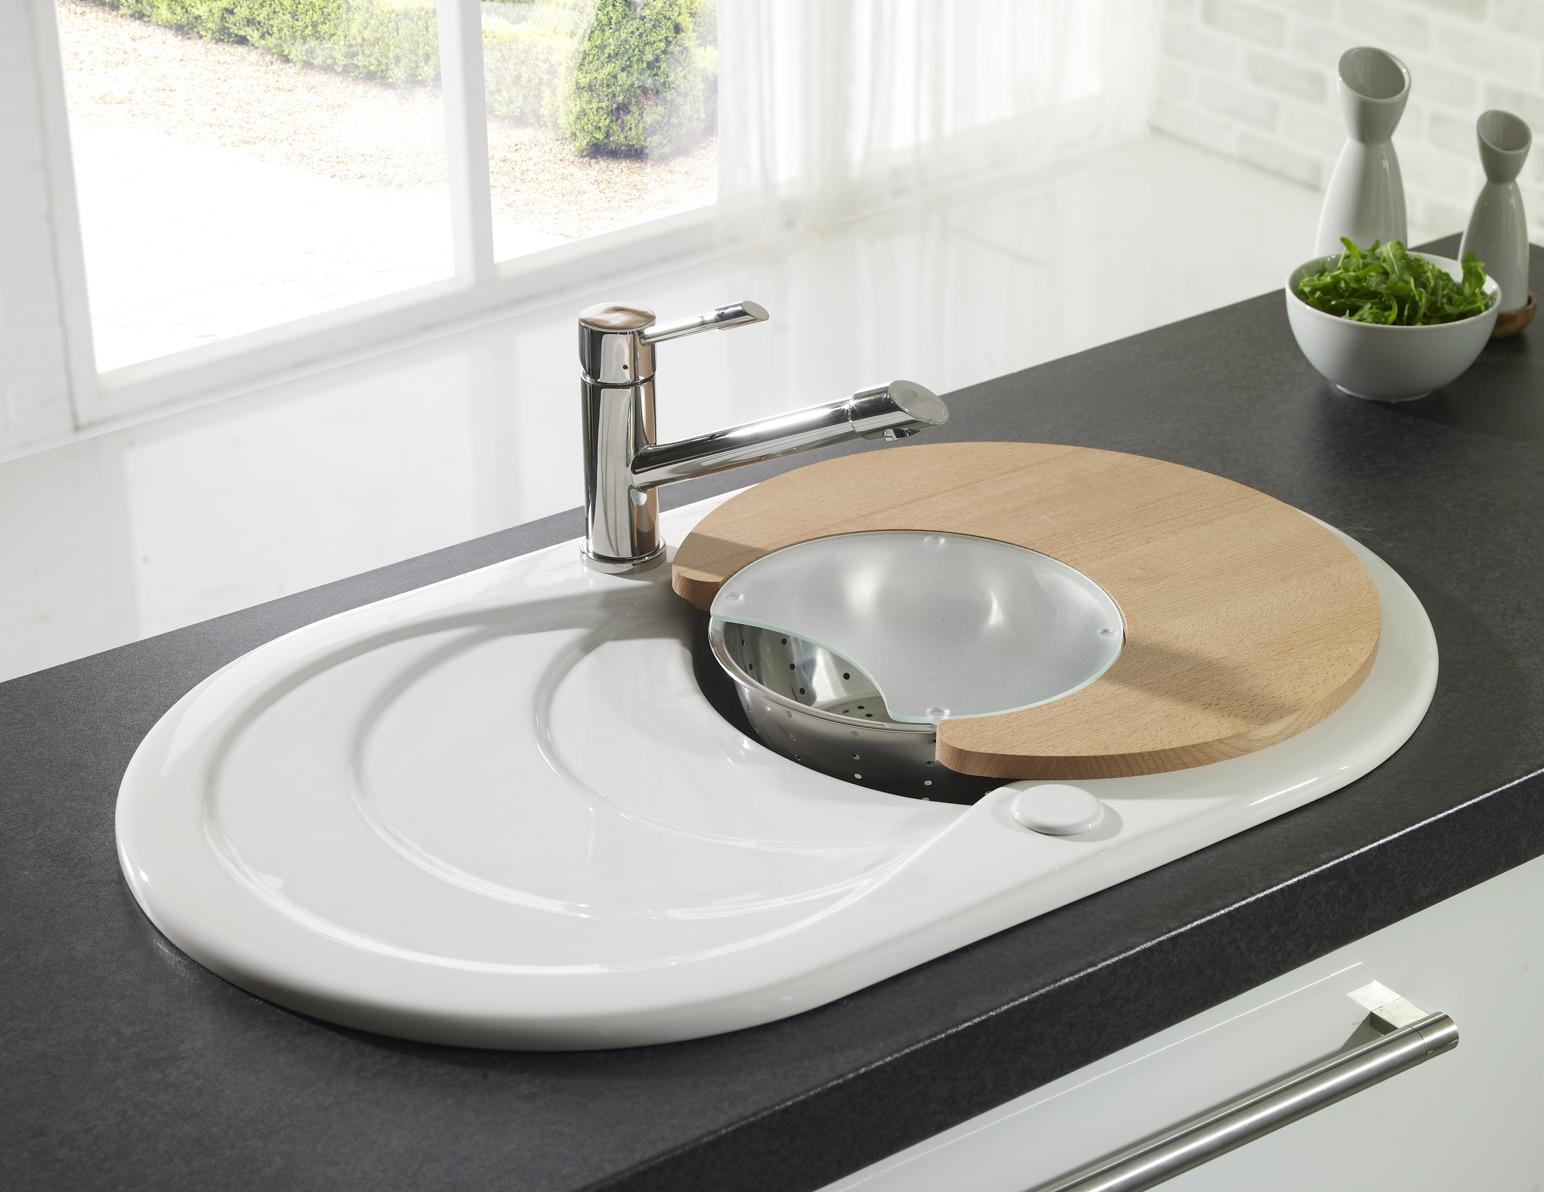 Astracast Cascade Ceramic Inset Sink 1 0 Bowl